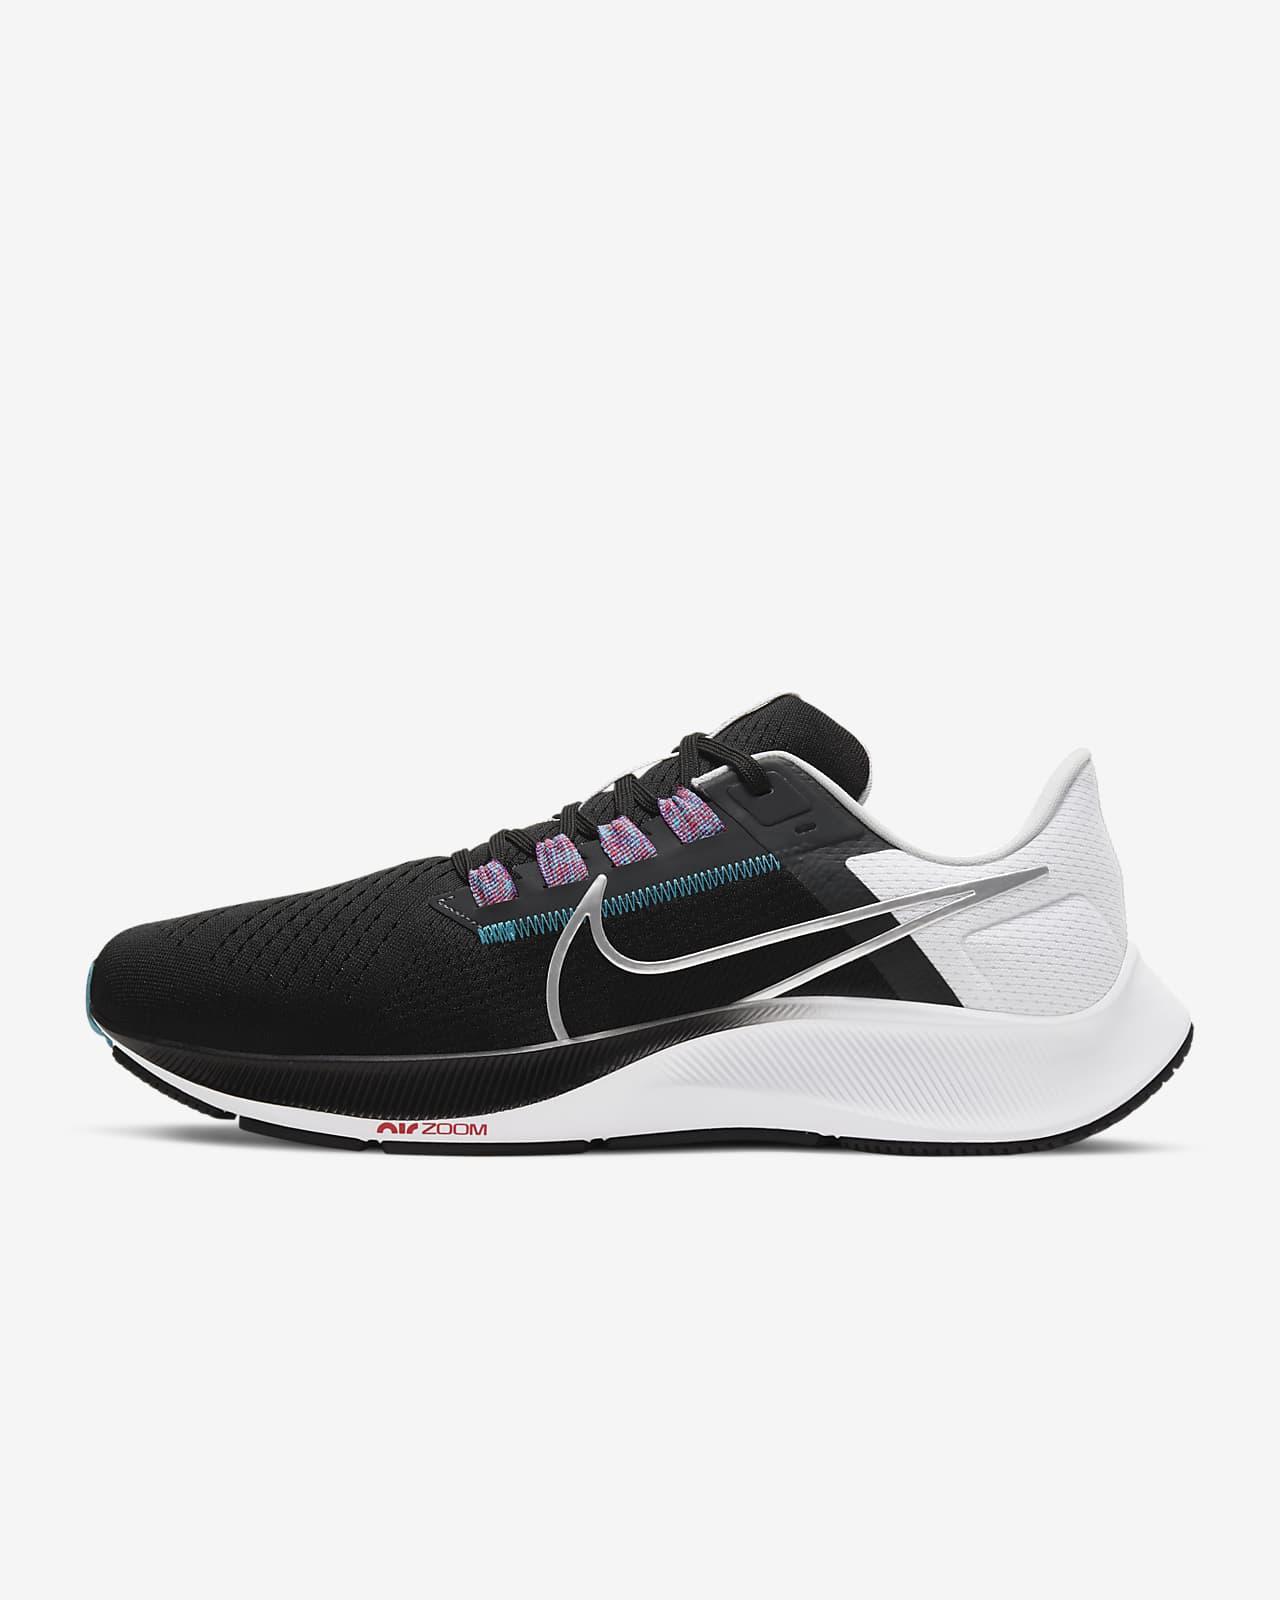 Chaussure de running Nike Air Zoom Pegasus38 pour Homme